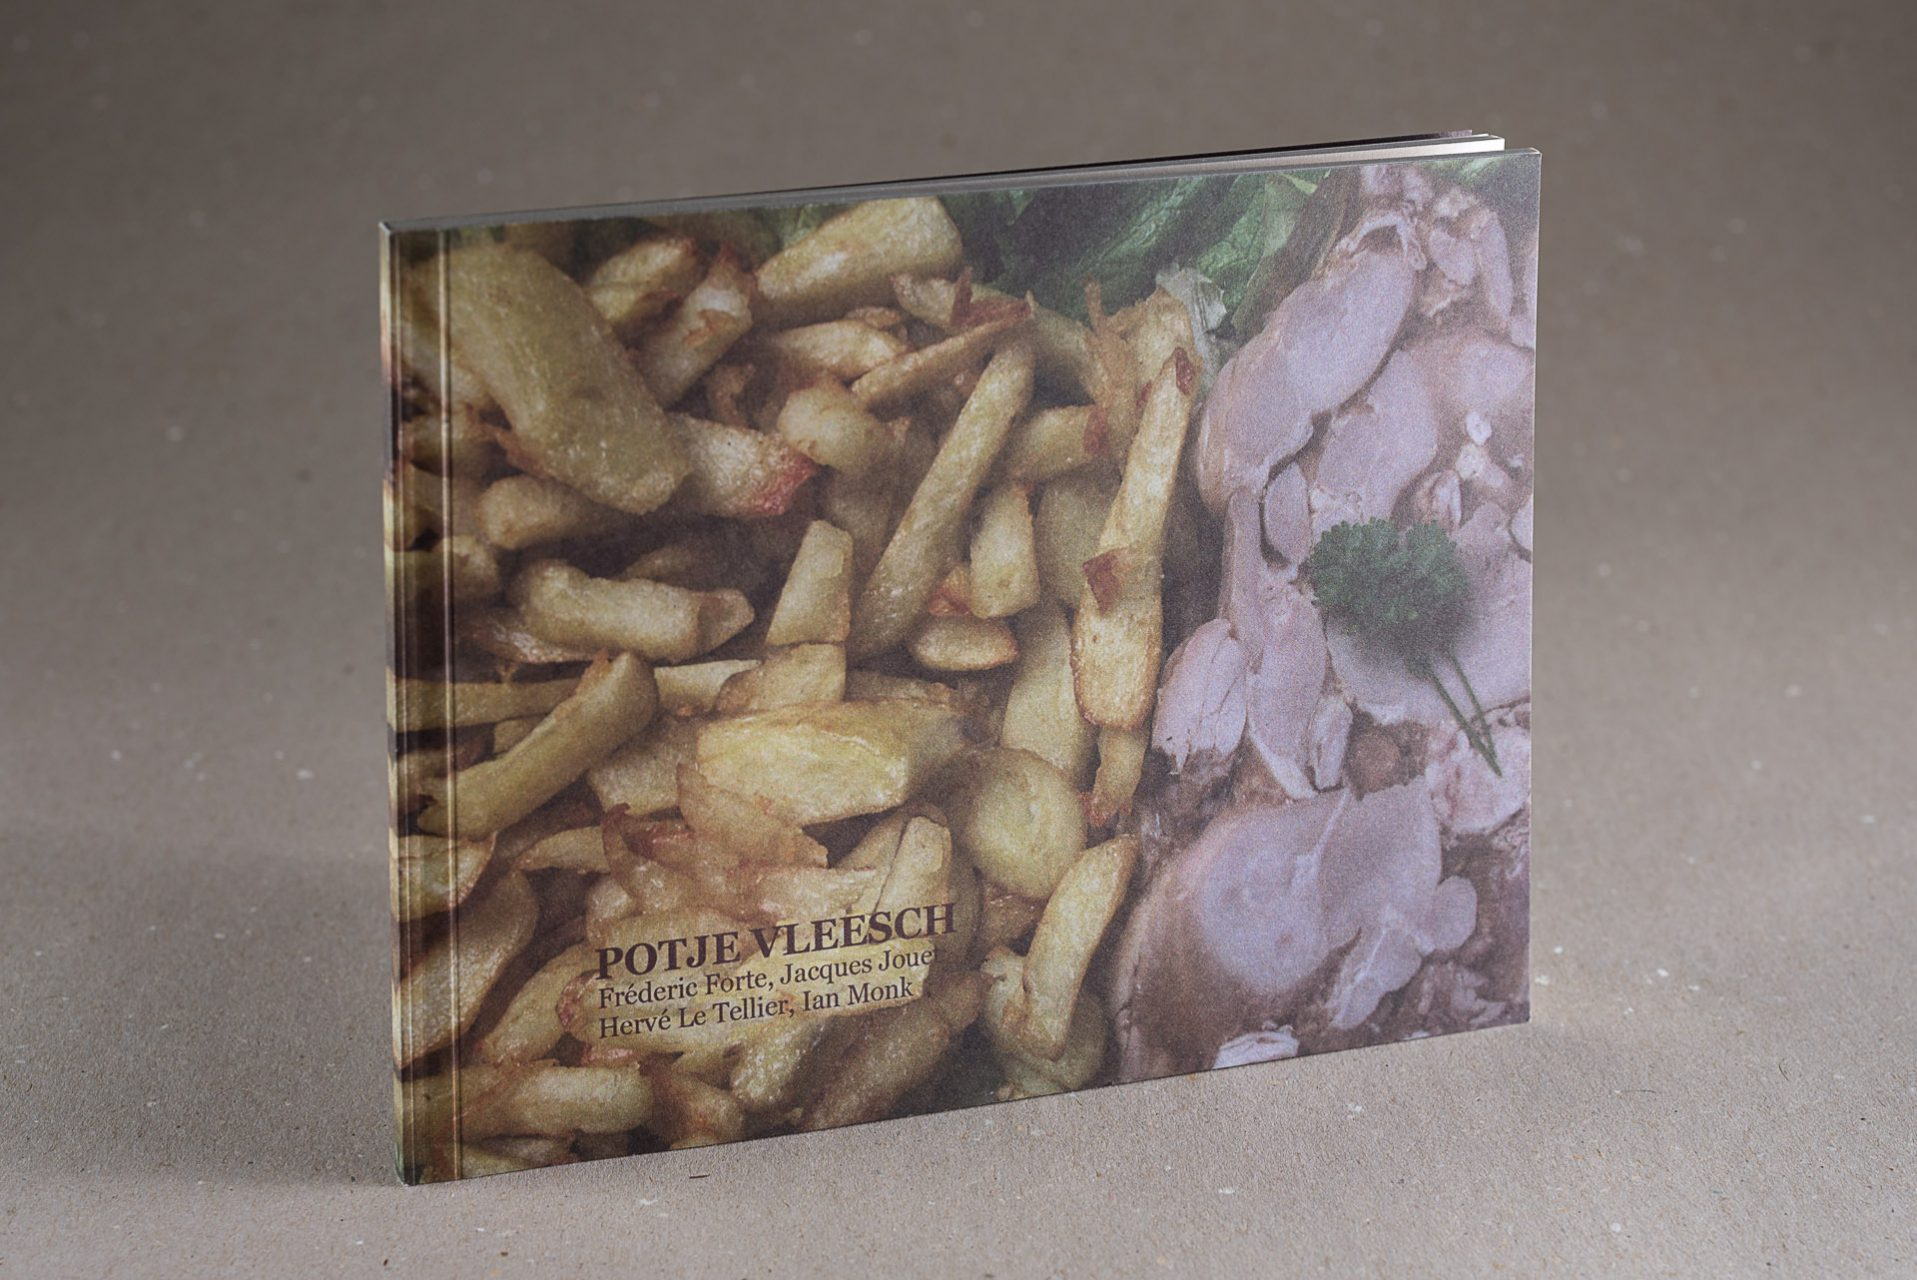 web-hd-nuit-myrtide-livre-potjevleesch-01